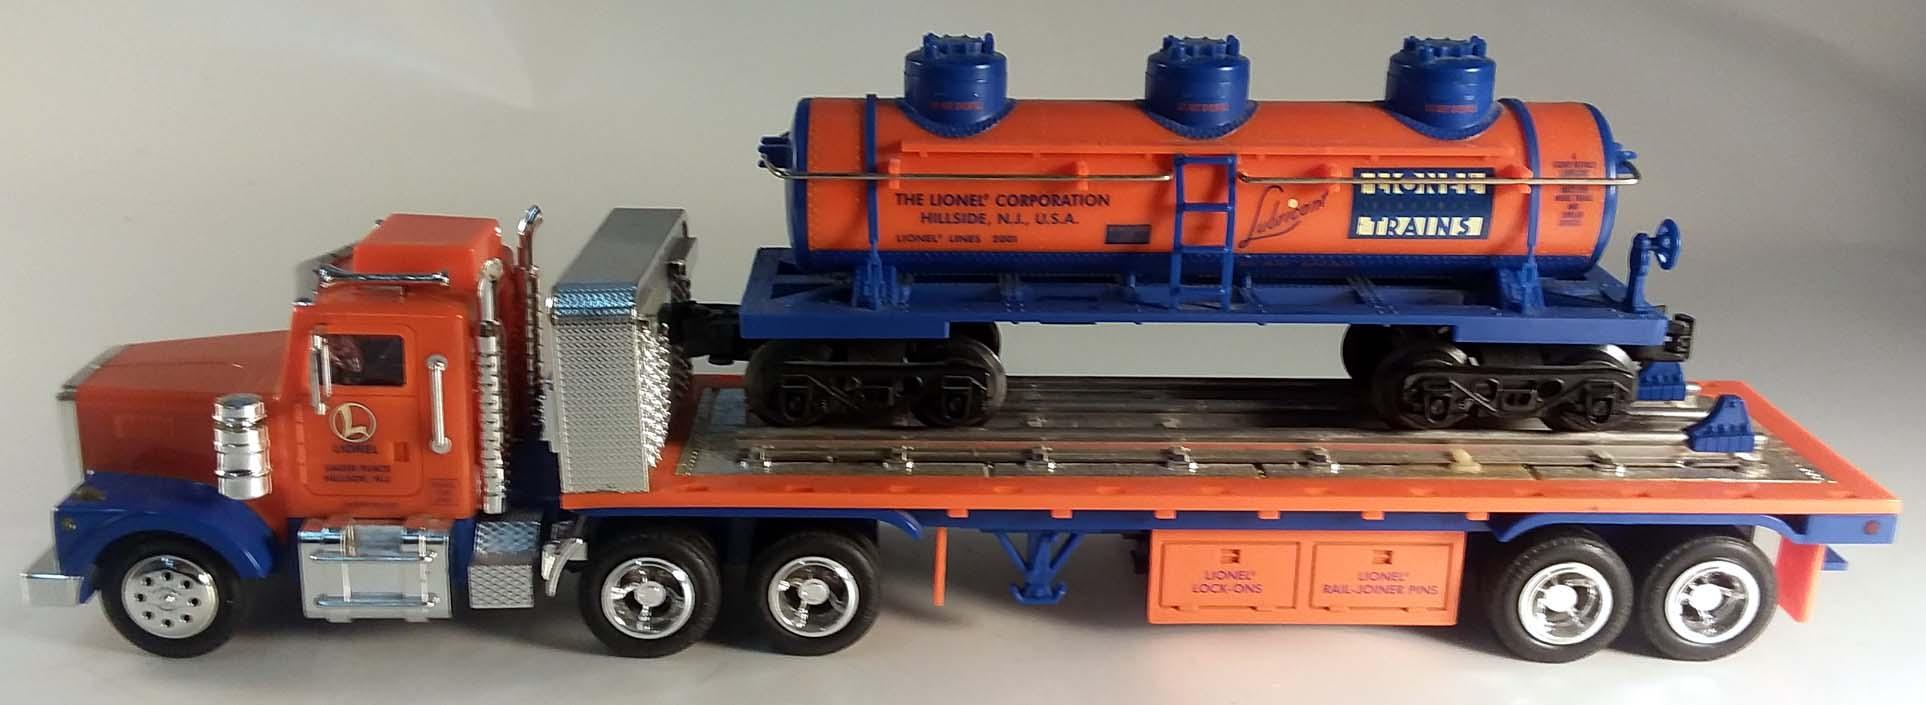 Lionel TMT-18410 Flatbed Truck w/ 3-dome Tank Car MIB